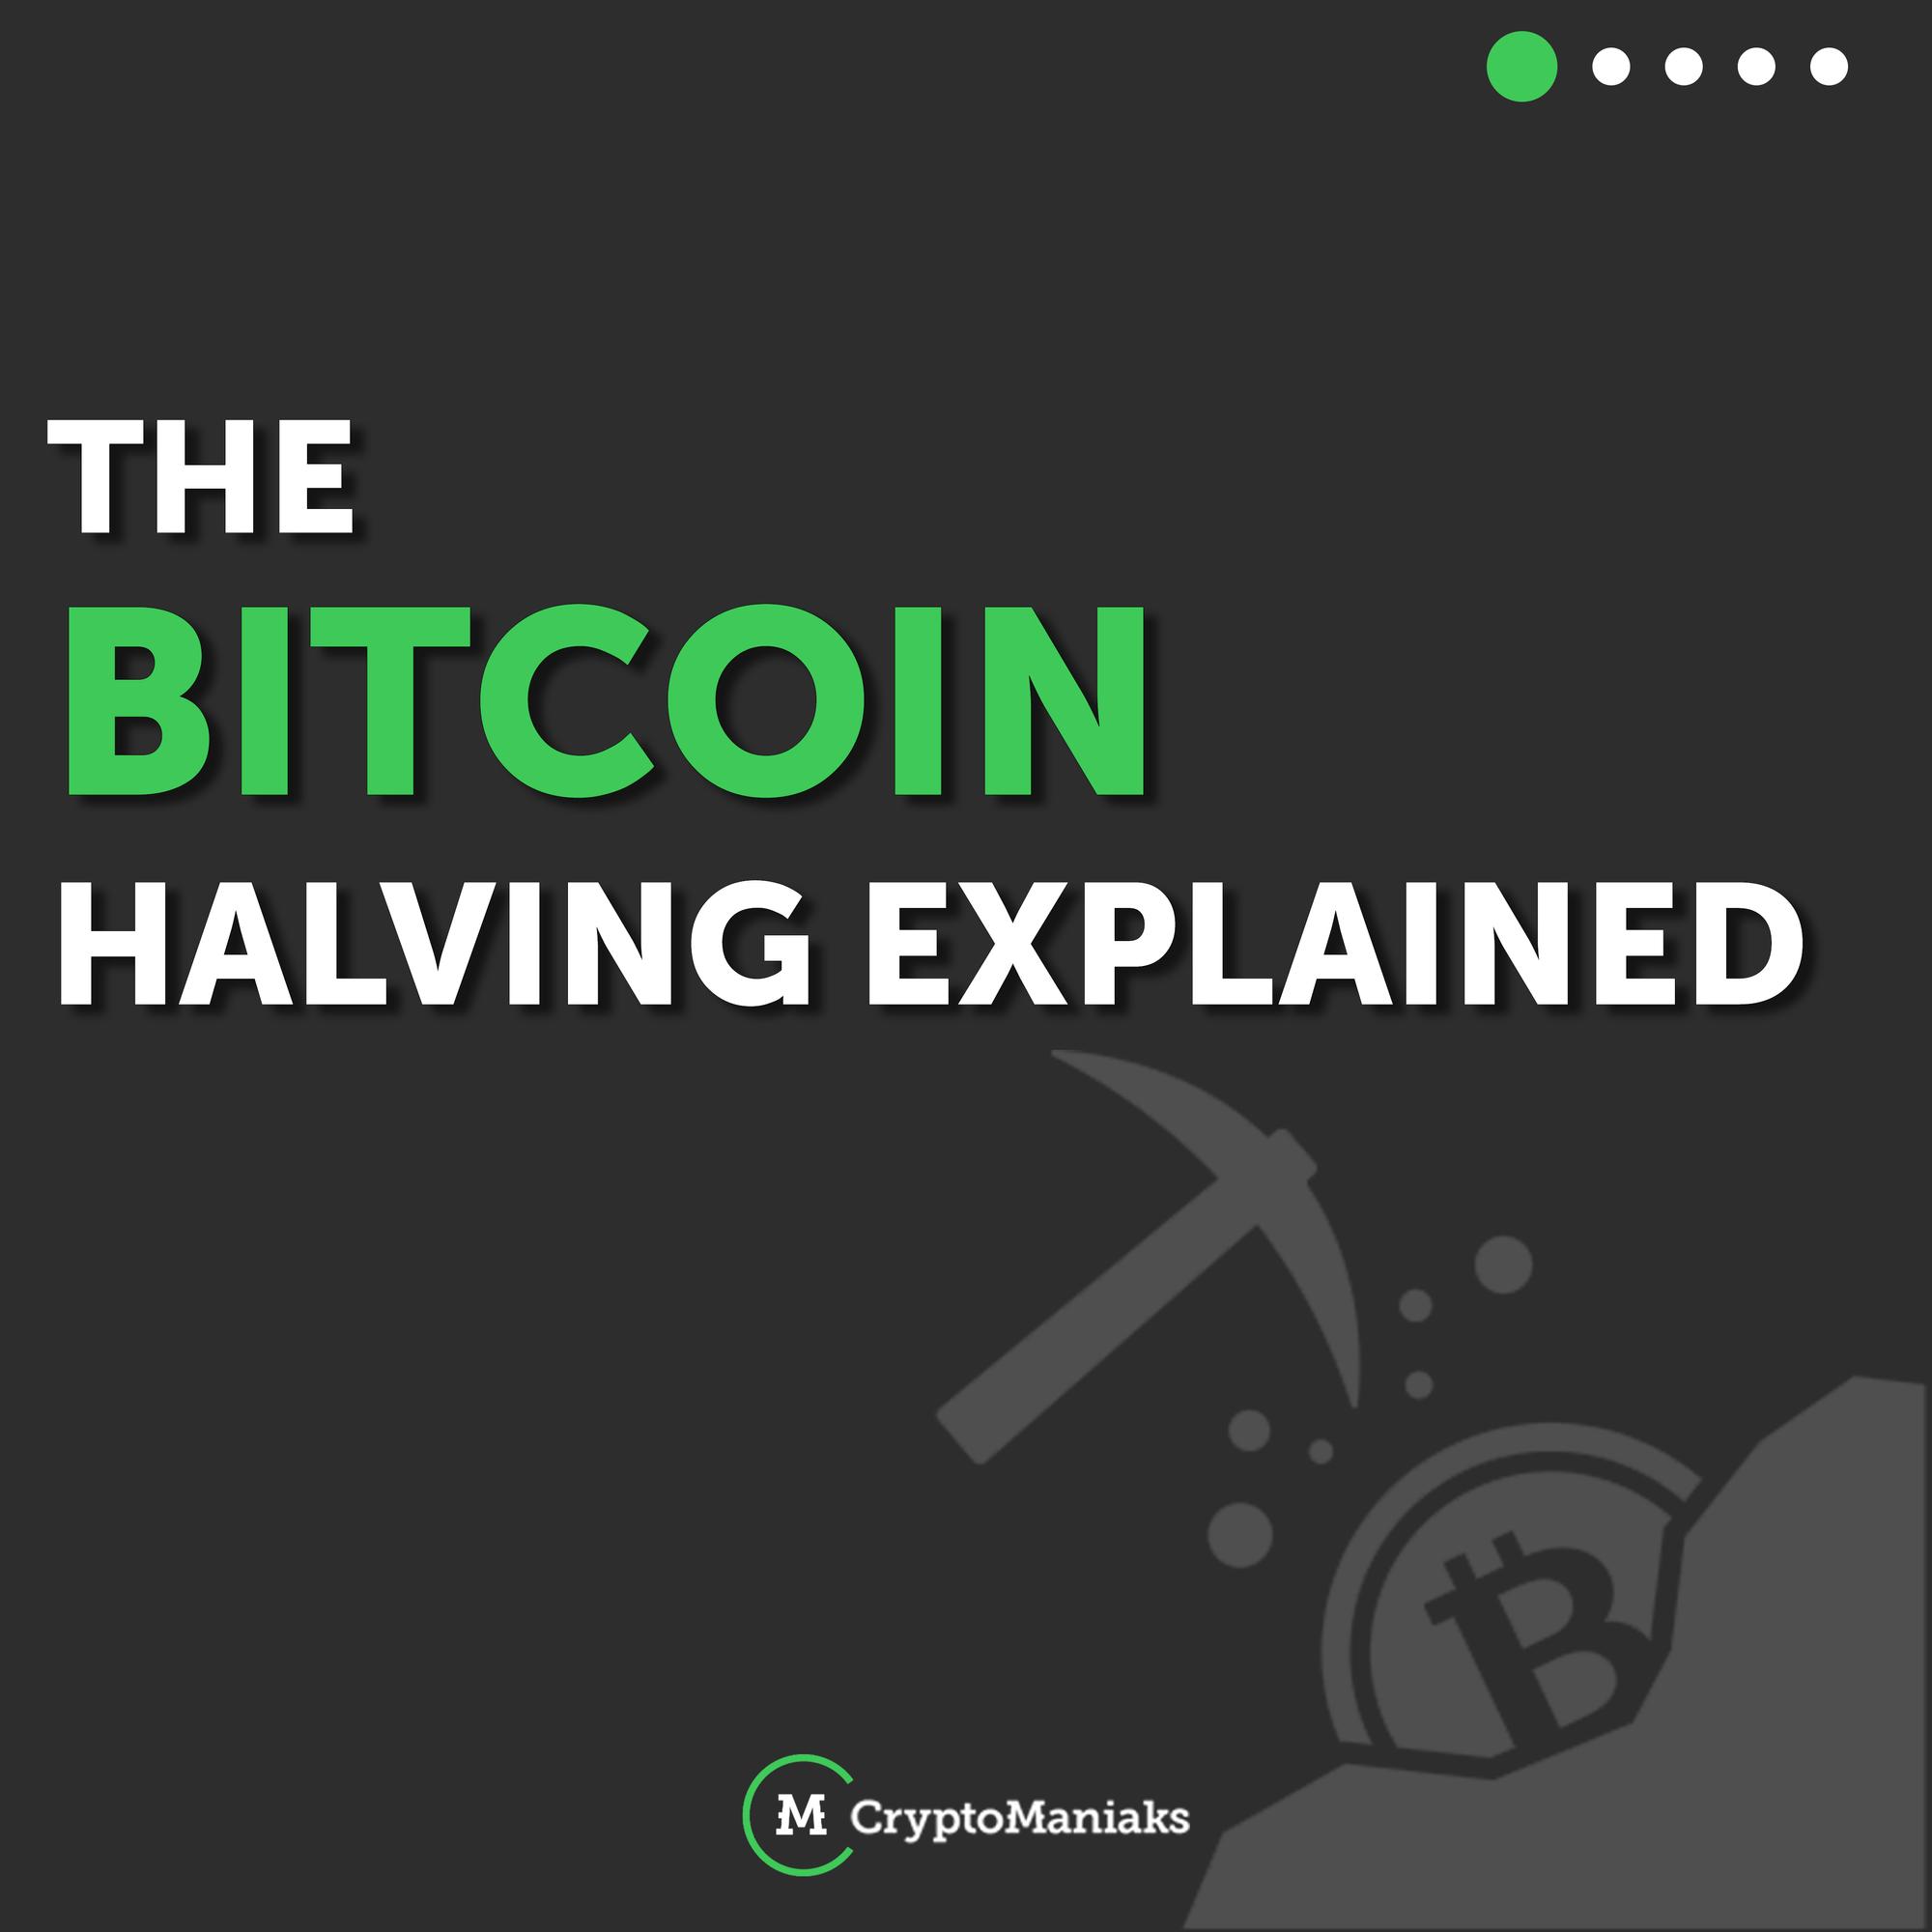 Bitcoins easily explained away kraken binary options